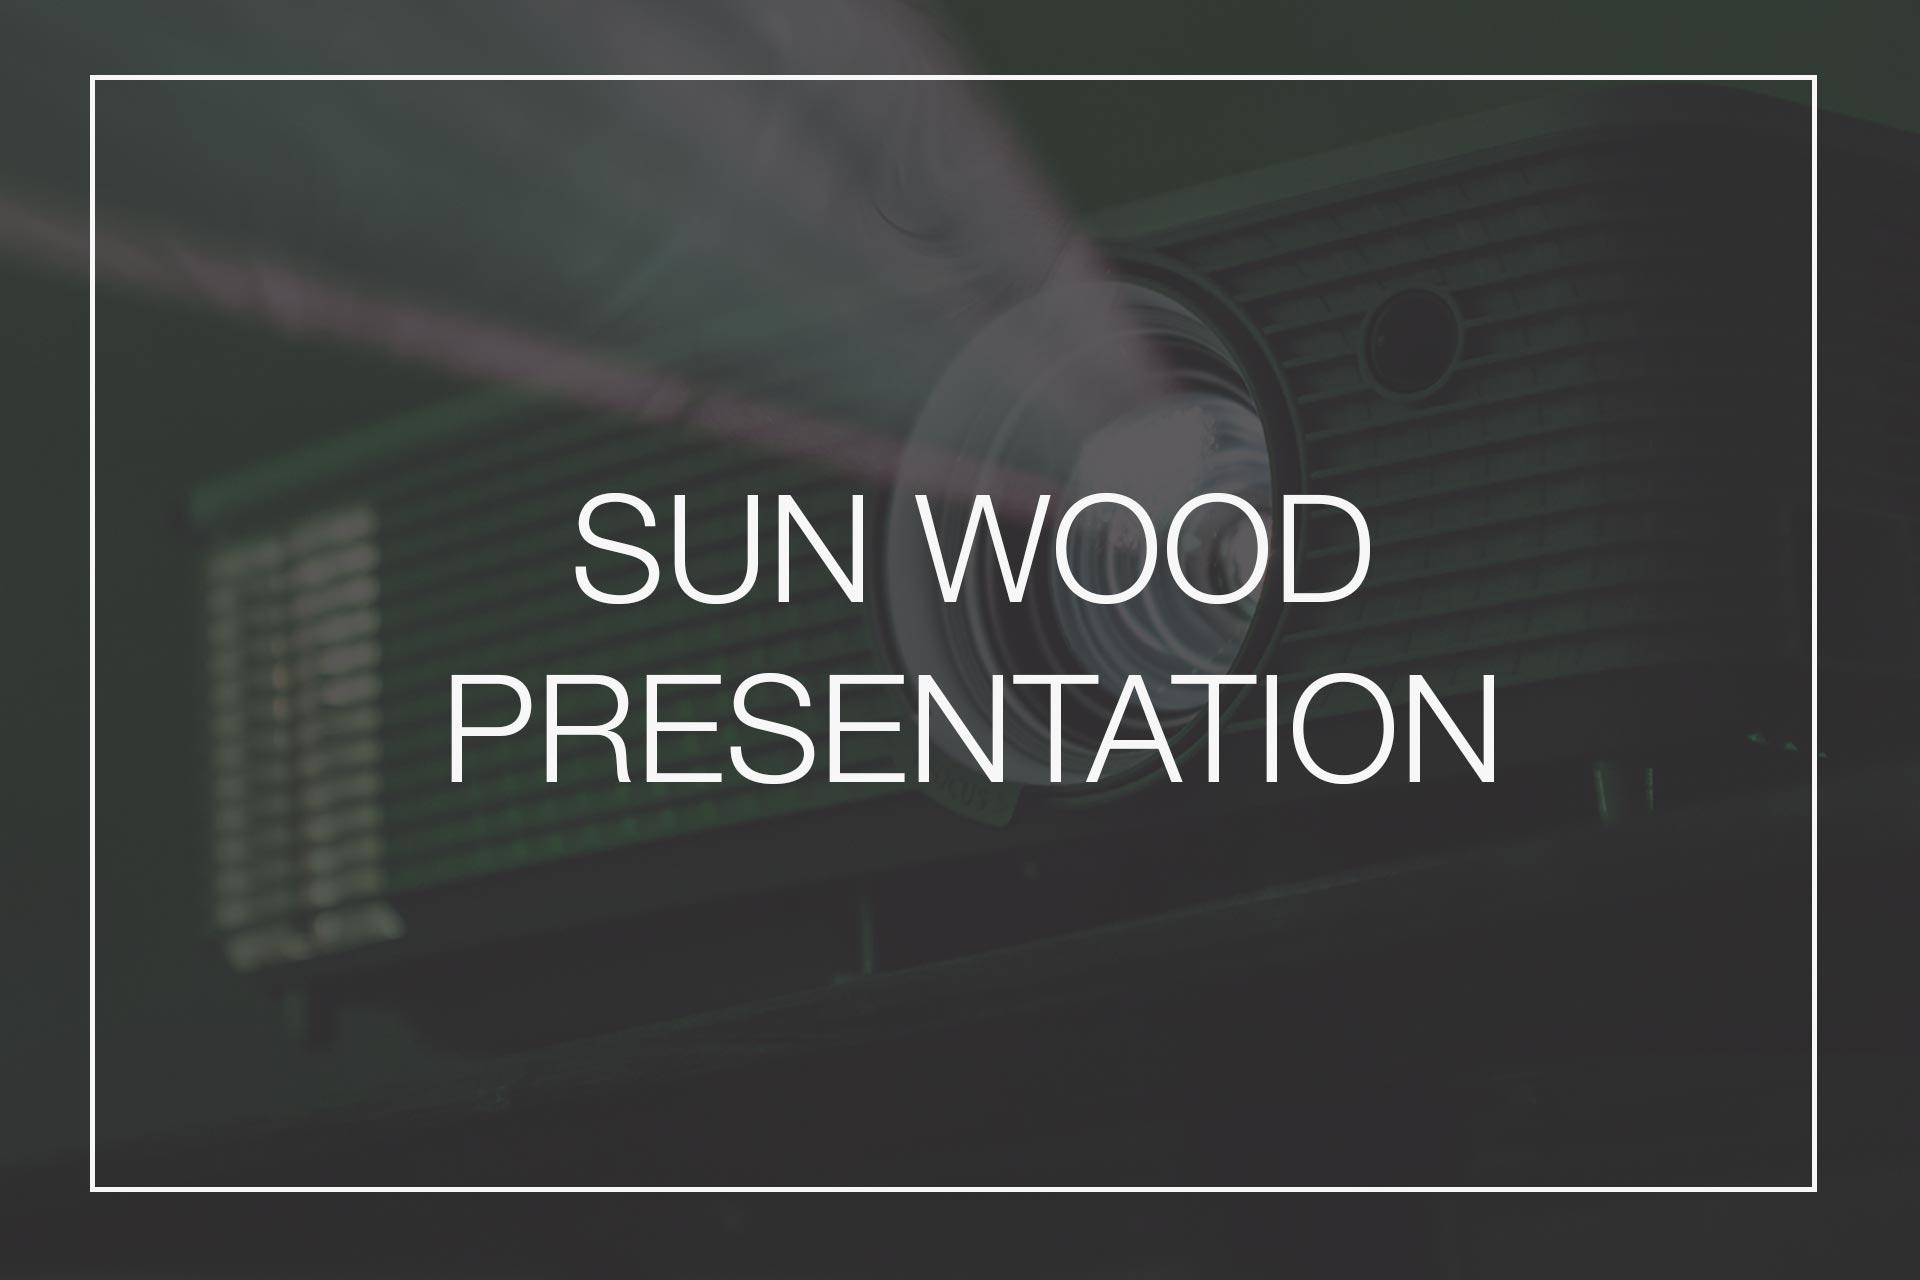 Presentation about SUN WOOD